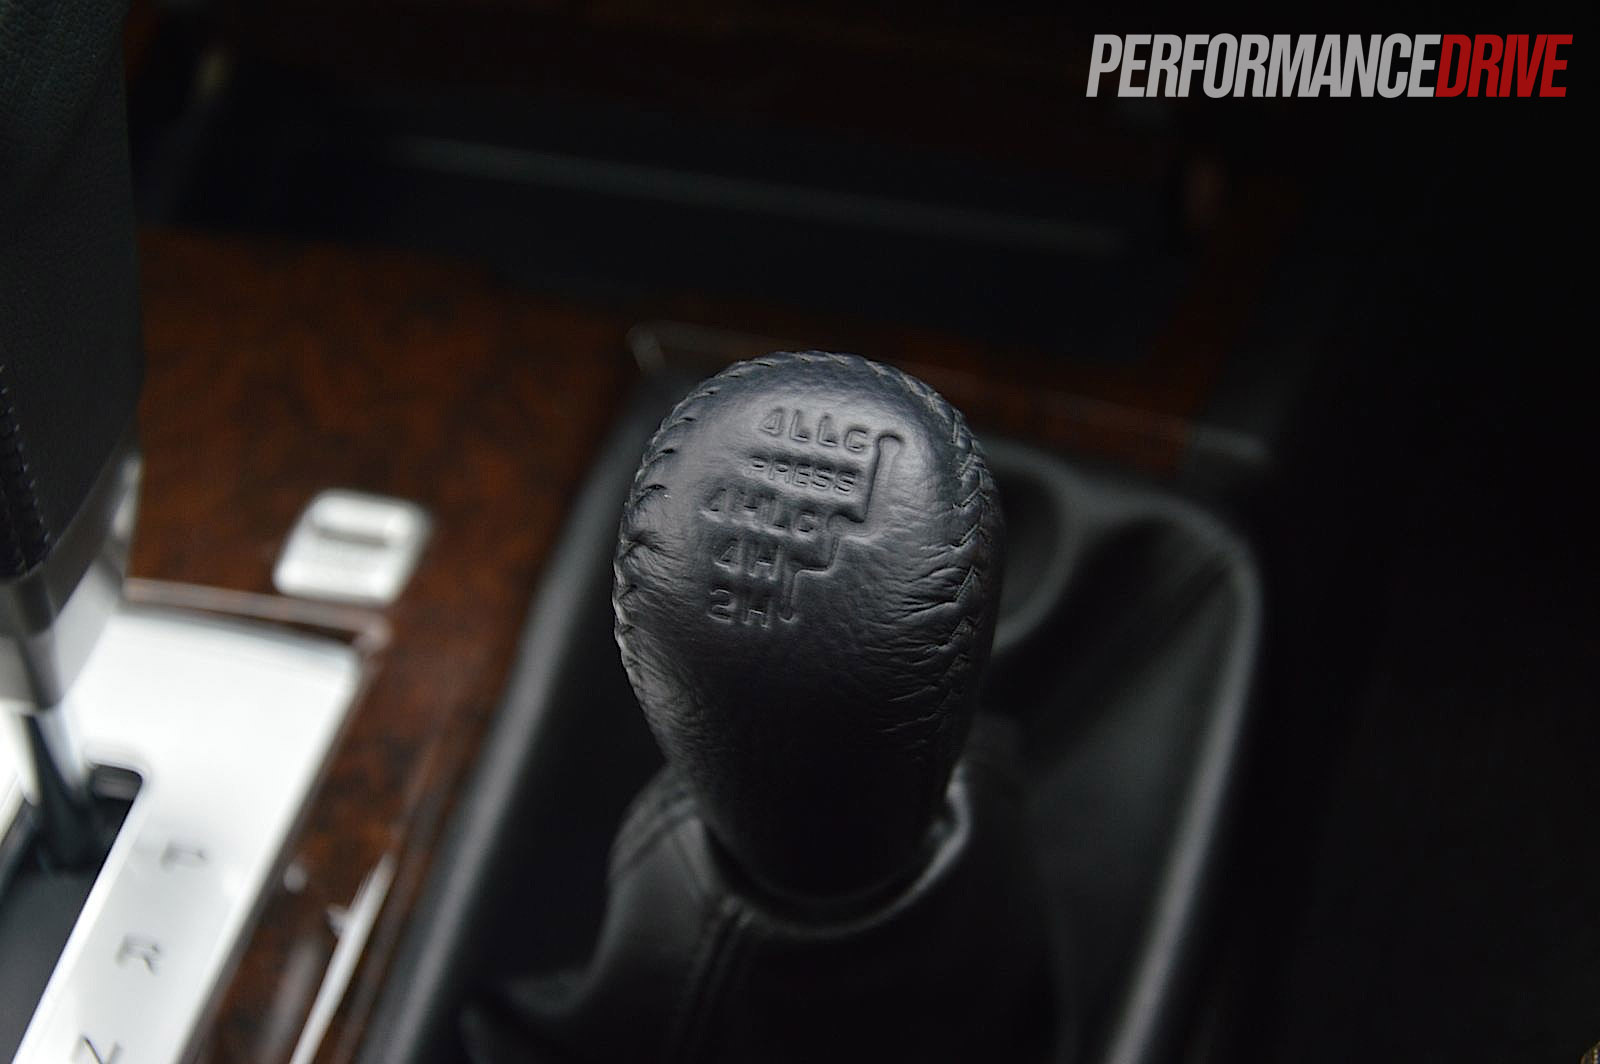 2013 Mitsubishi Challenger Xls Transfer Case